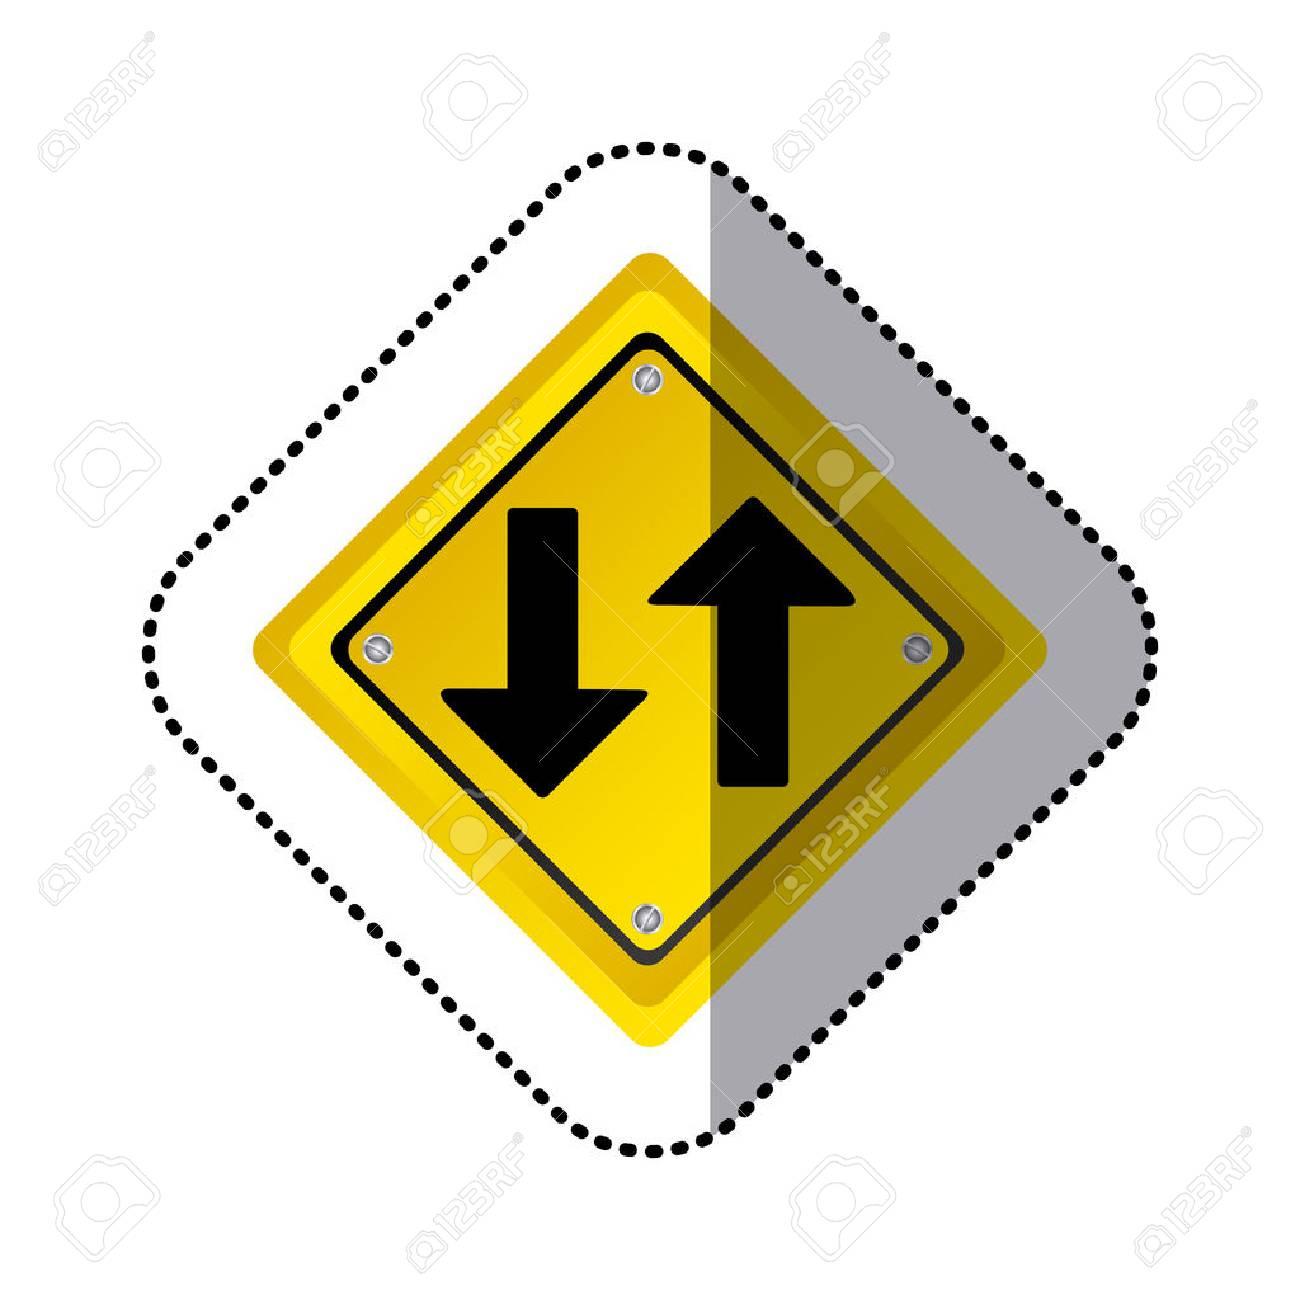 sticker yellow diamond shape frame two way traffic sign vector illustration - 73904037